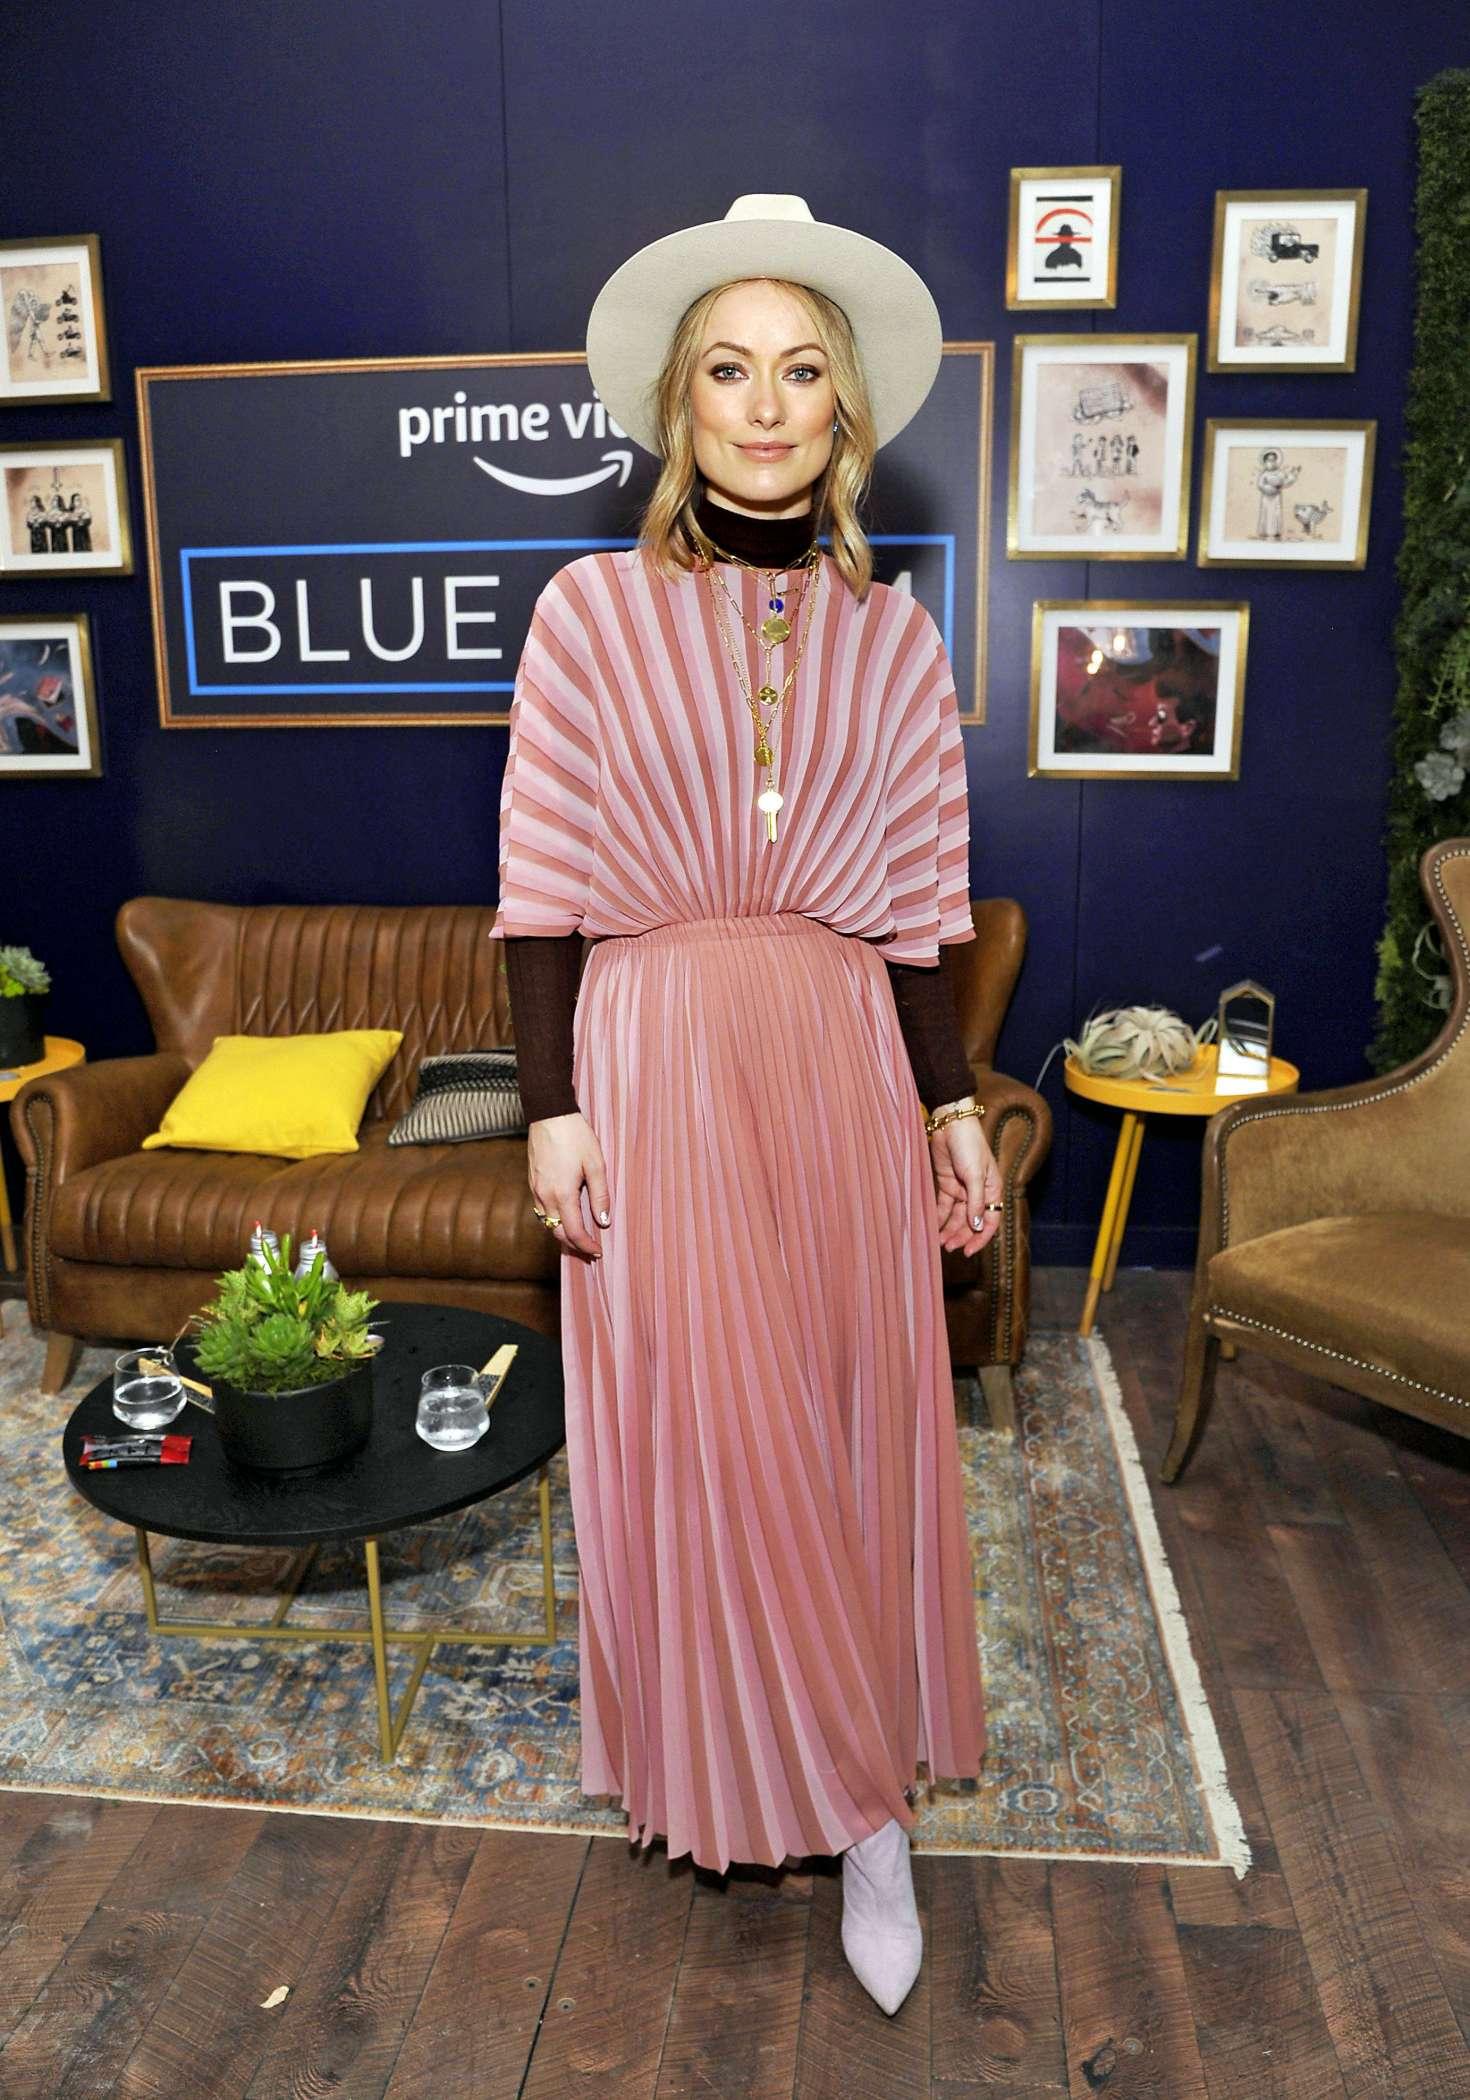 Olivia Wilde - Prime Video Blue Room at 2019 SXSW Festival in Austin